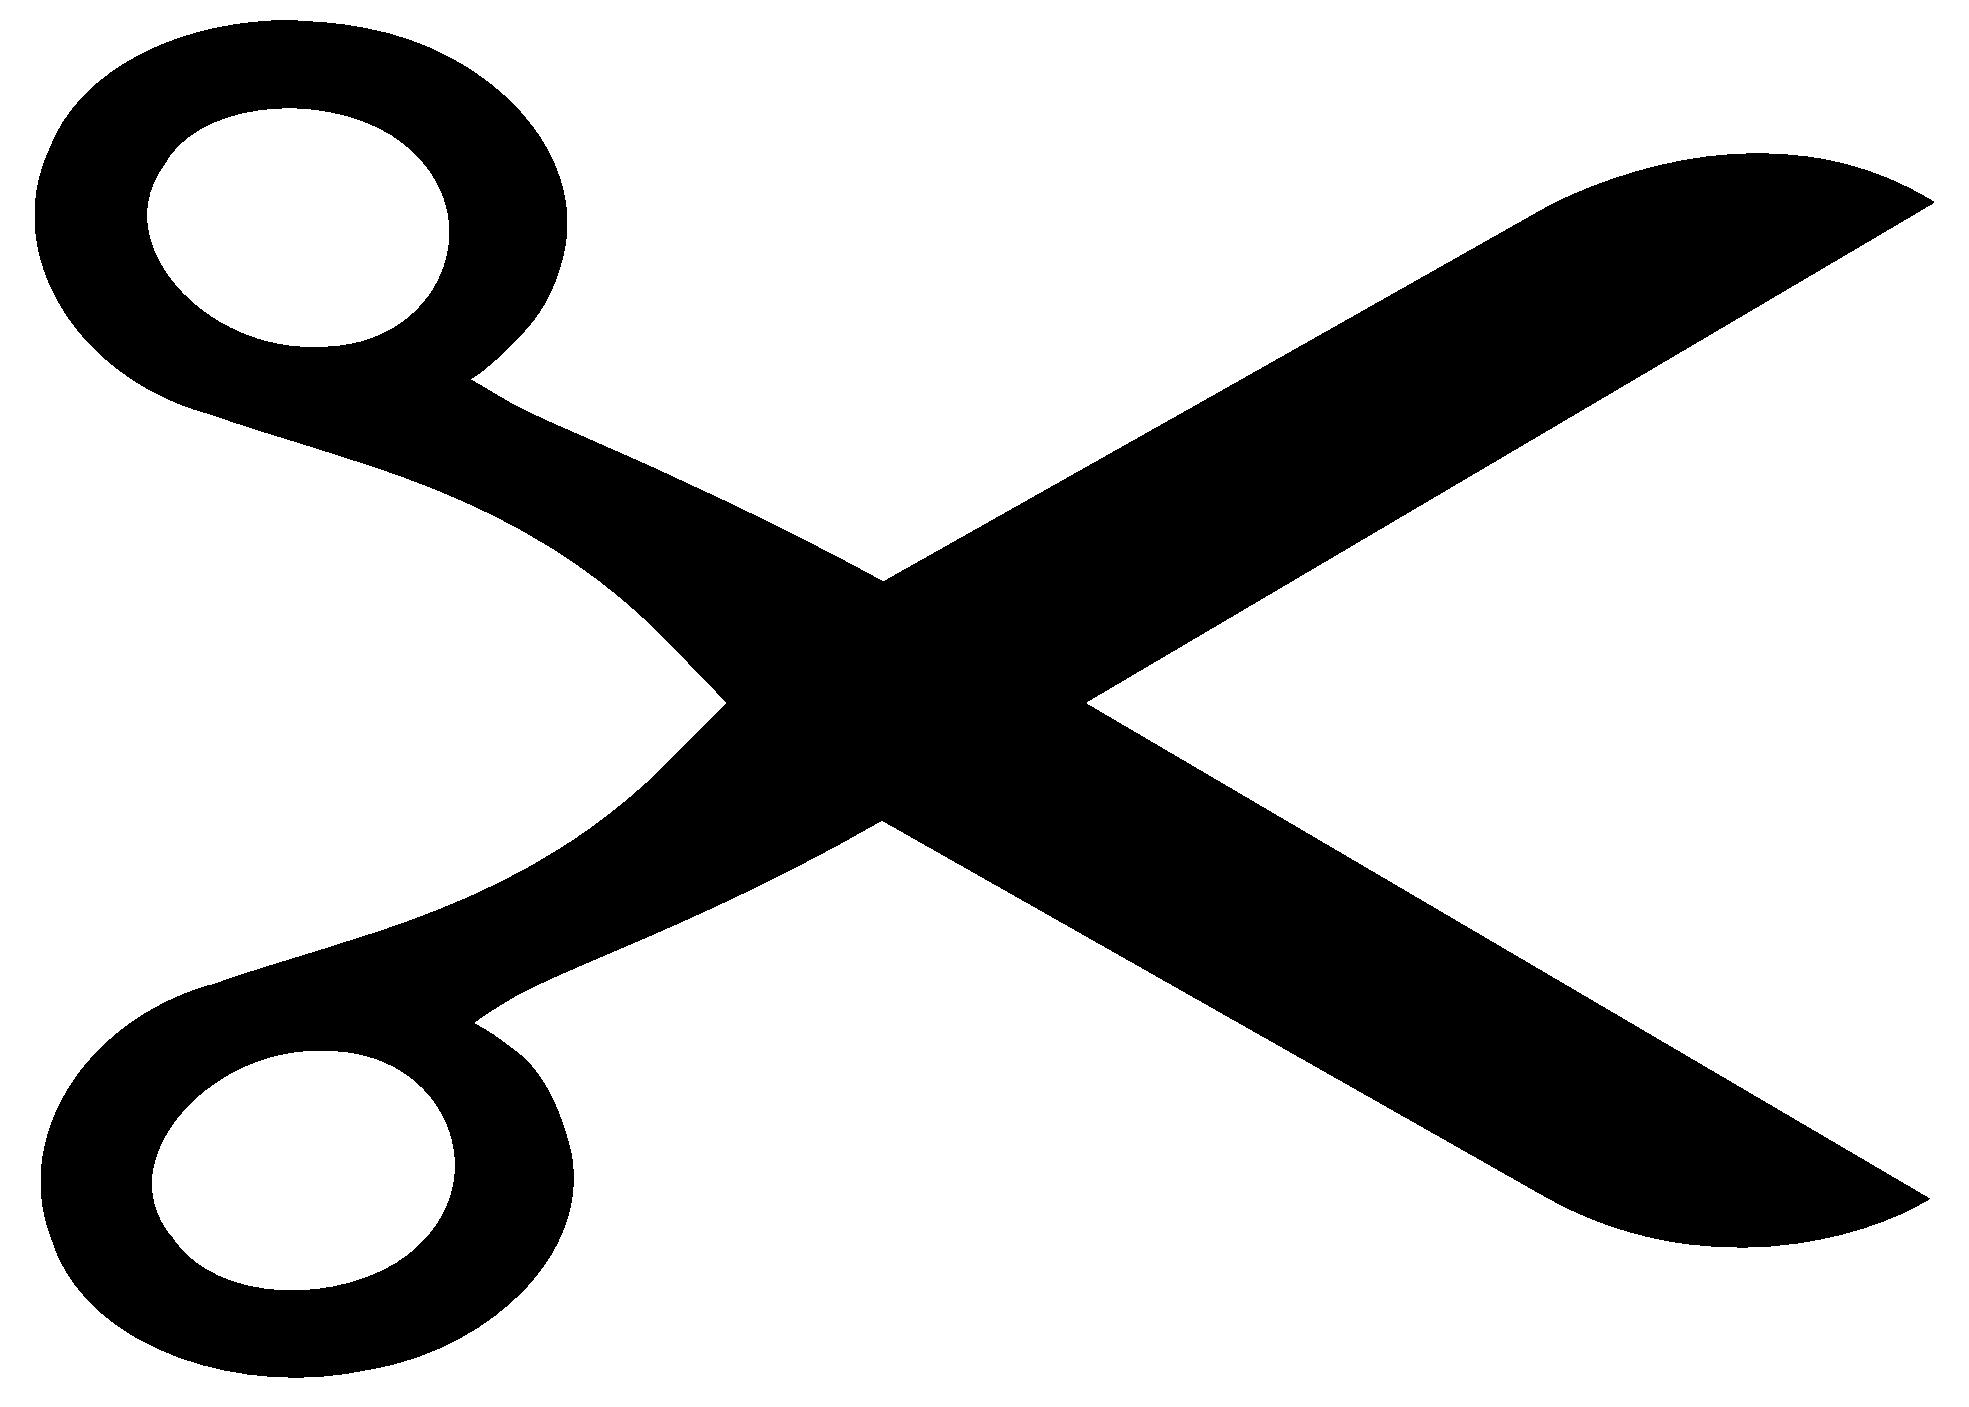 Galaxy clipart large. Clipartist net clip art